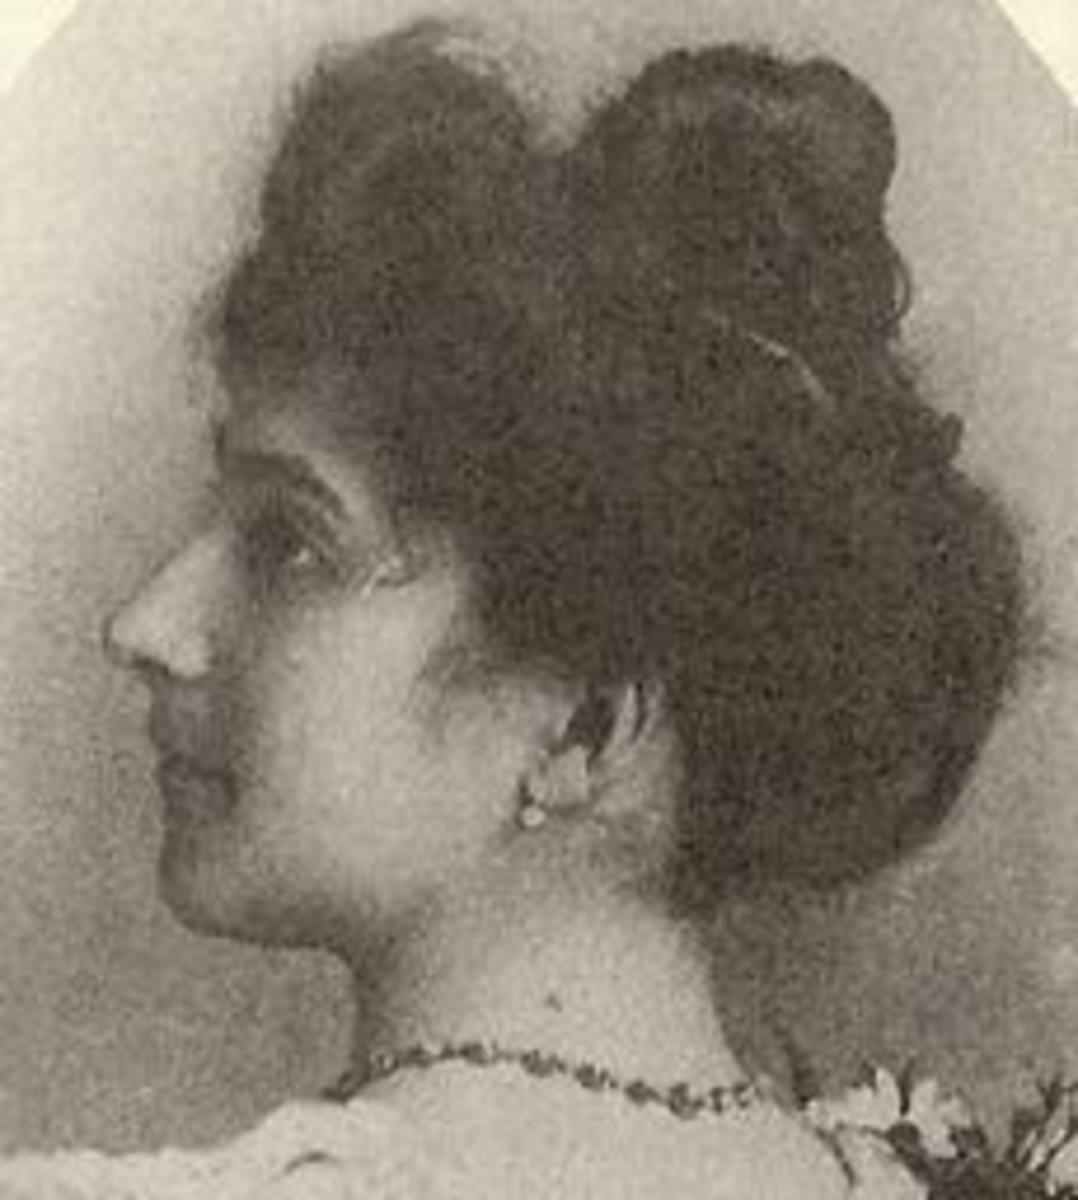 Jeanne Louise Calment at 20